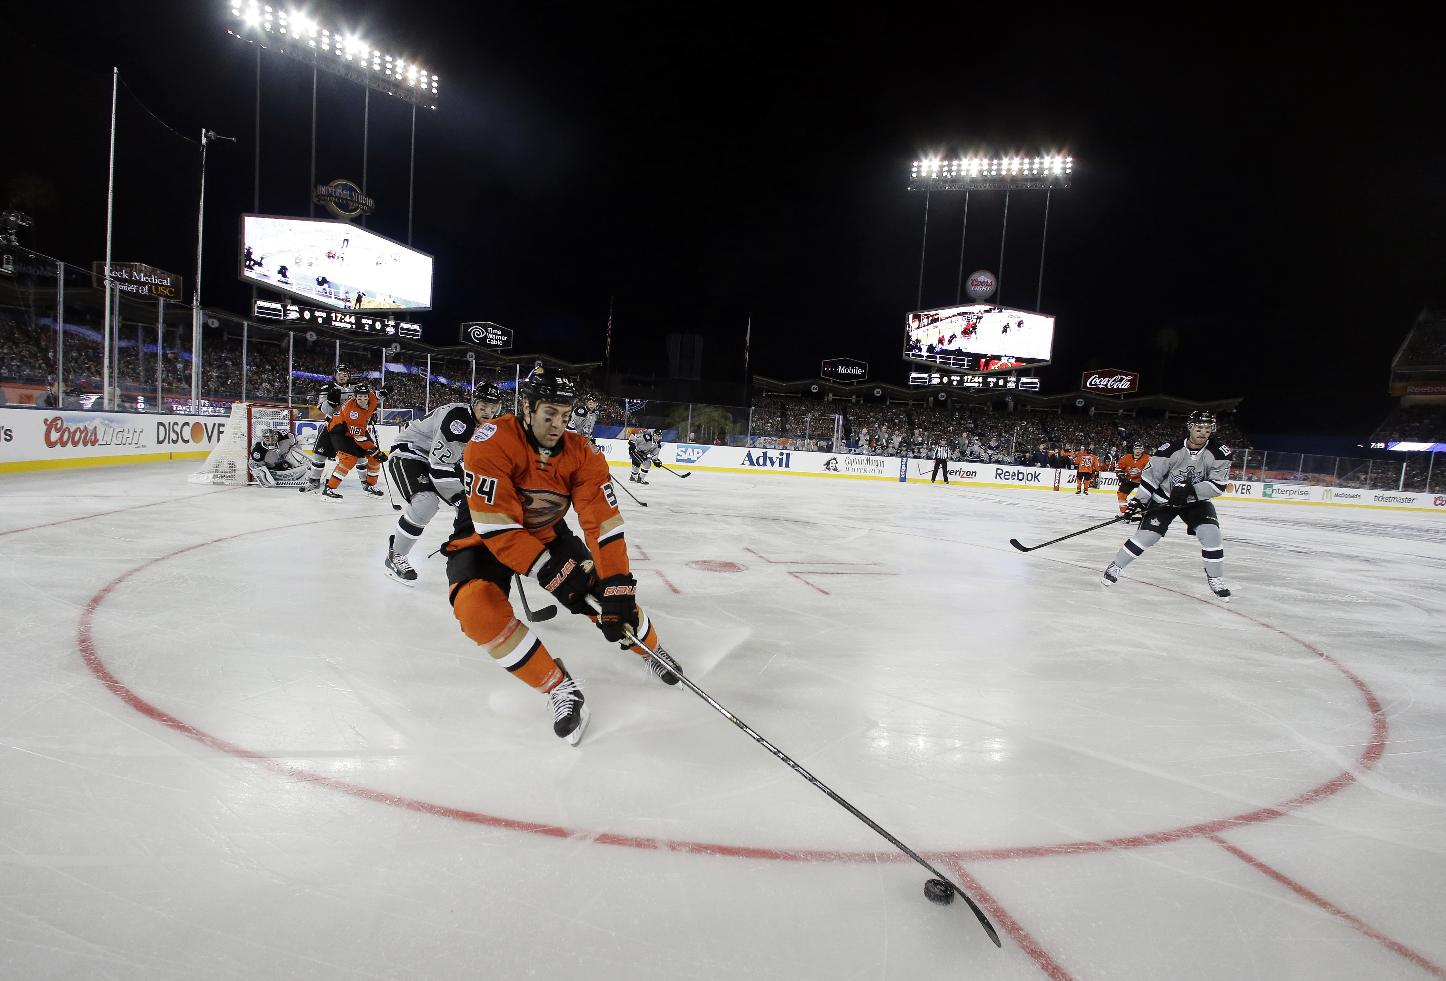 Ducks beat LA Kings 3-0 on Dodger Stadium ice